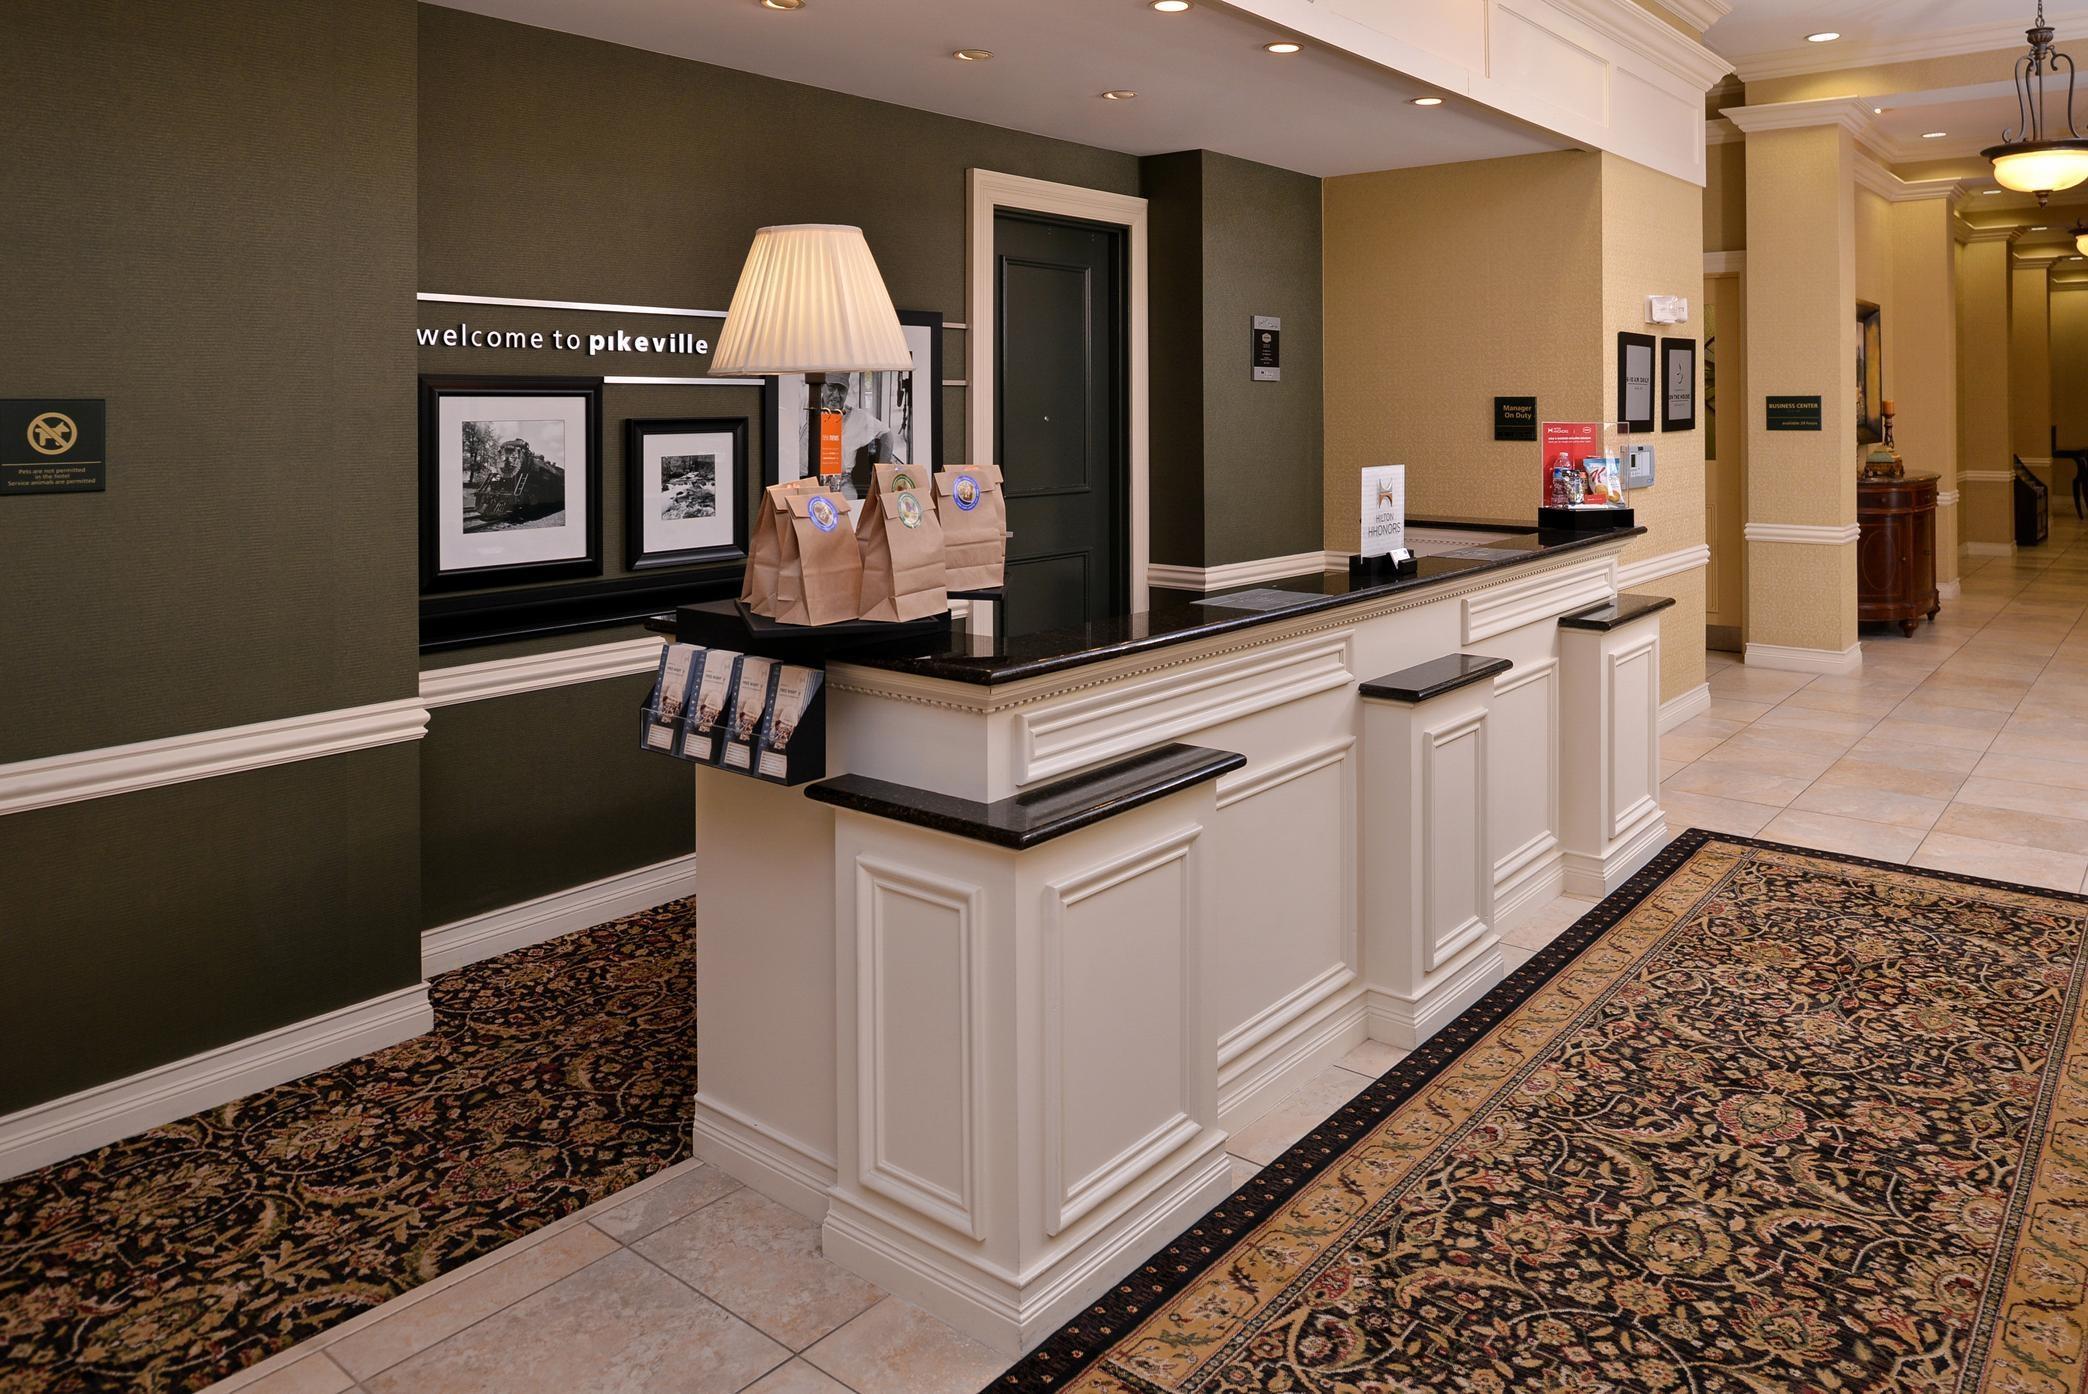 Hampton Inn Pikeville image 6